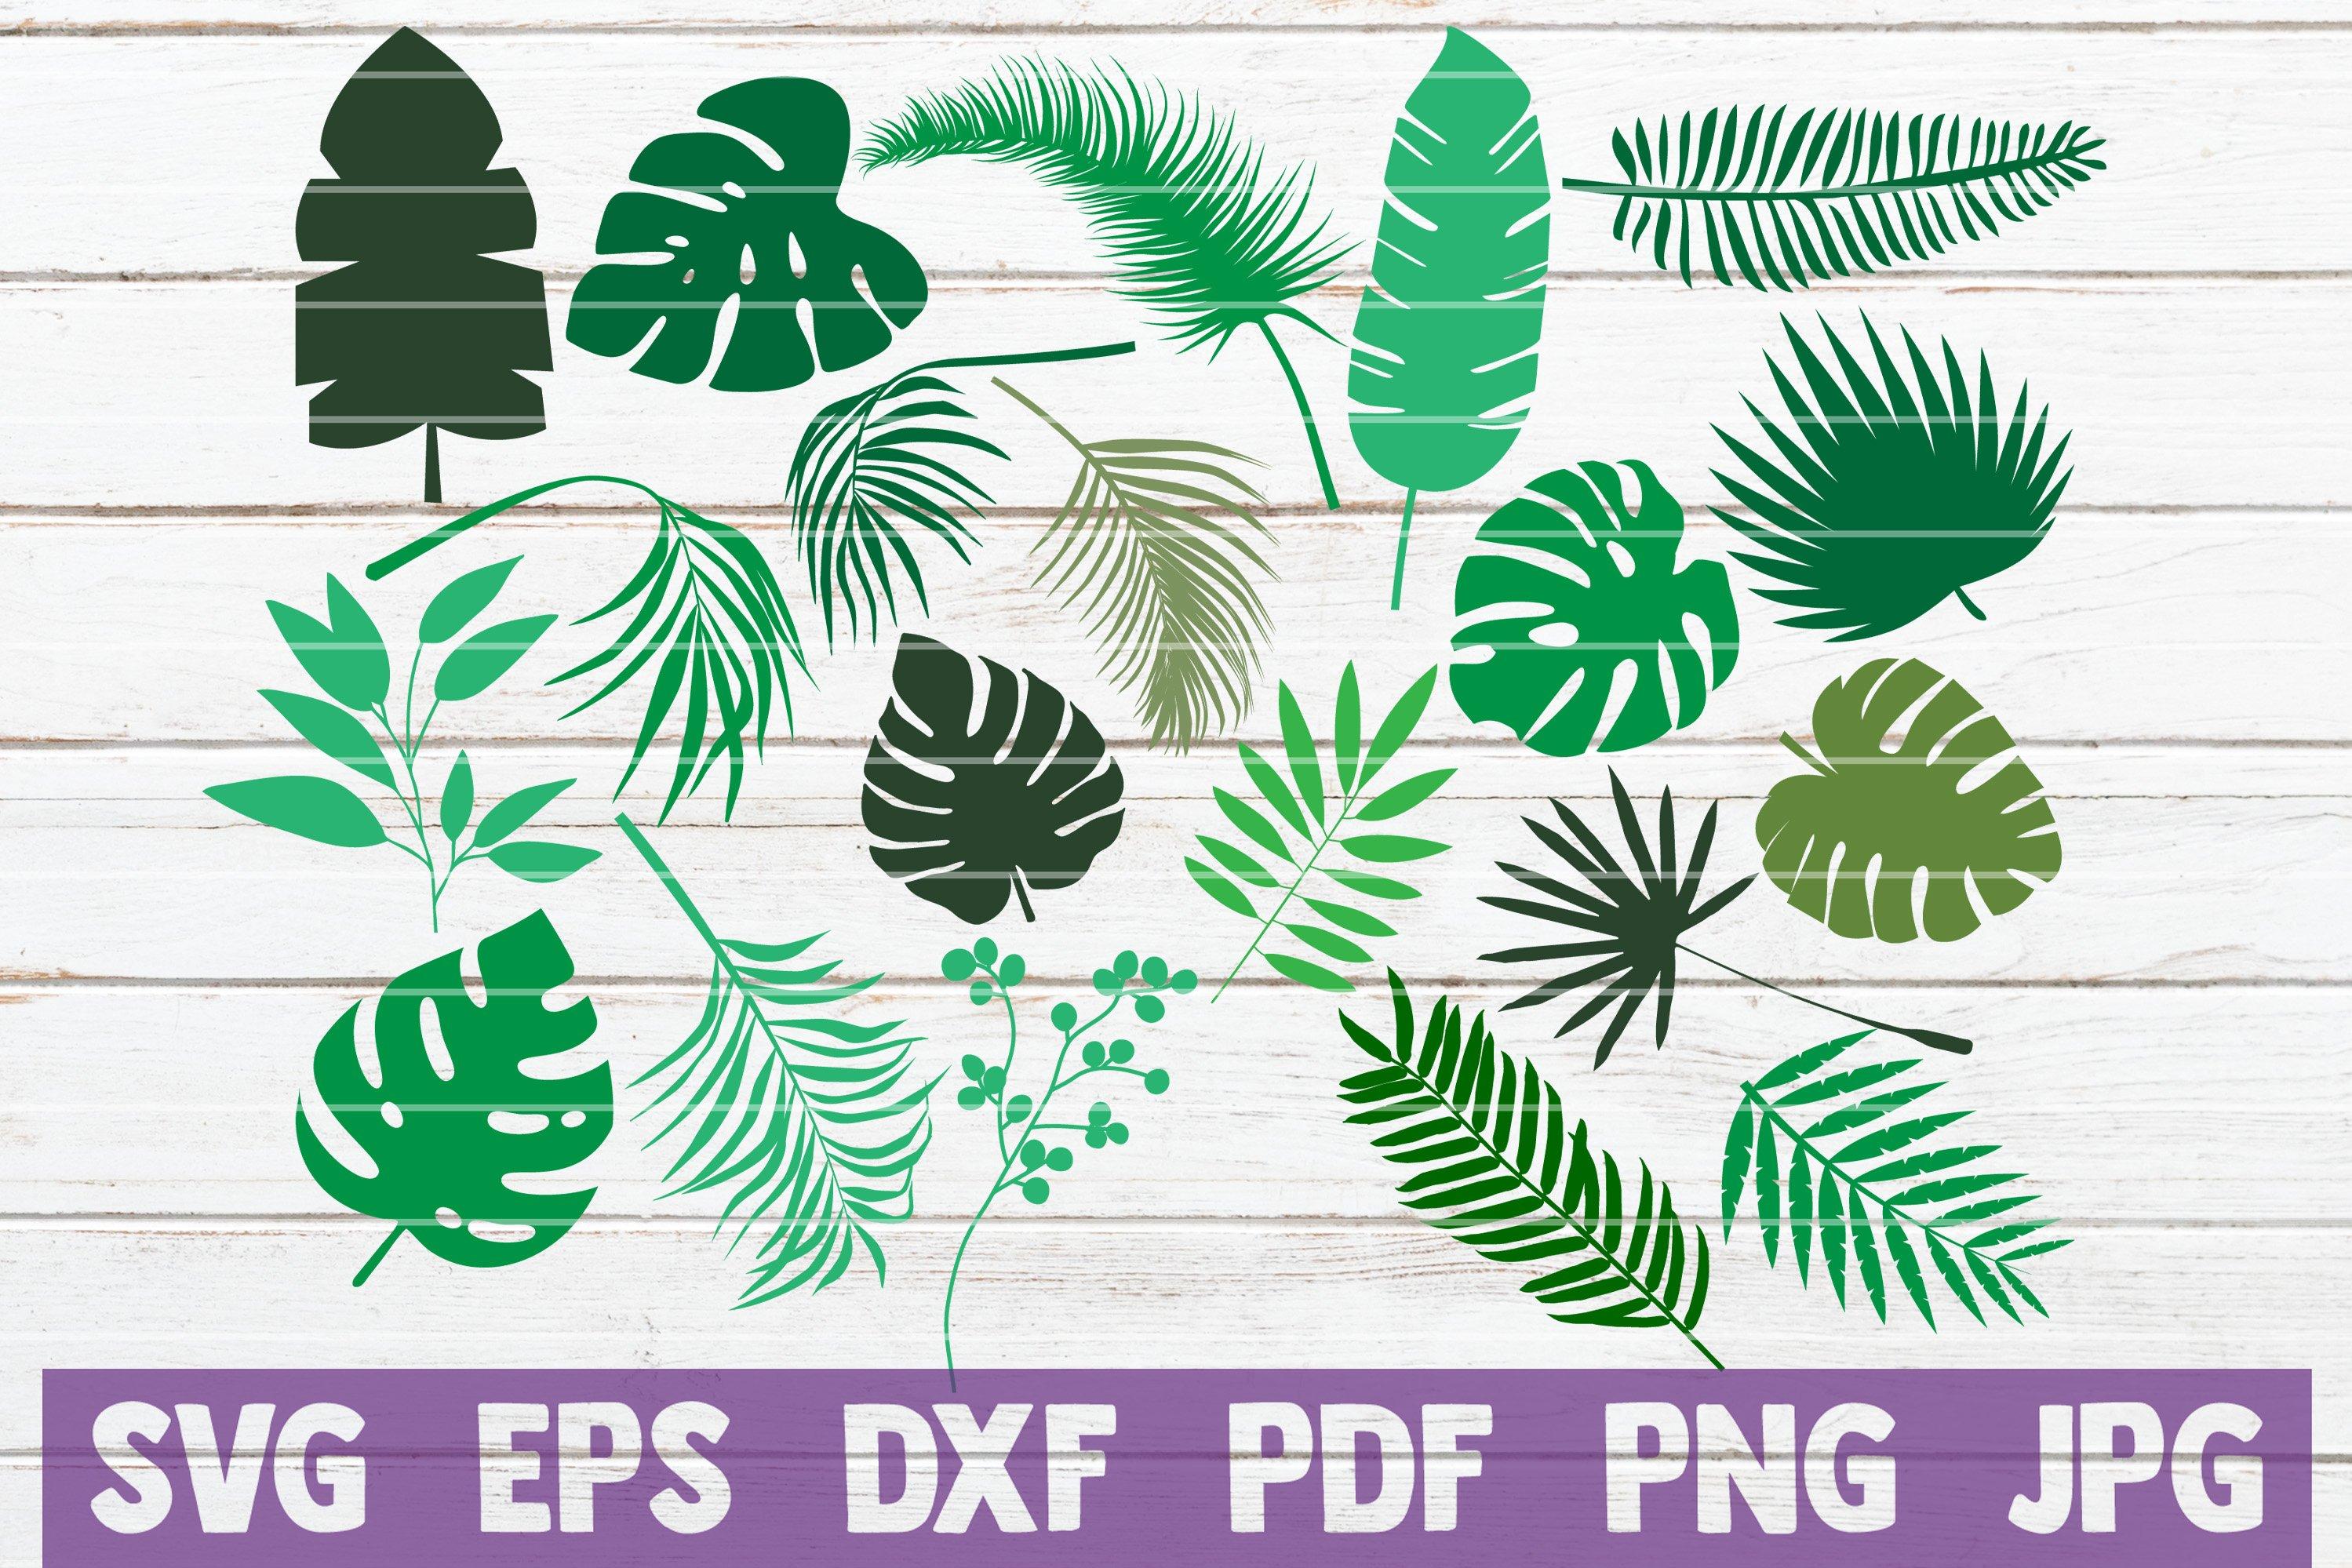 20 Tropical Leaves Paper Leaves Svg 223488 Cut Files Design Bundles Tropical leaf free vector we have about (5,584 files) free vector in ai, eps, cdr, svg vector illustration graphic art design format. 20 tropical leaves paper leaves svg